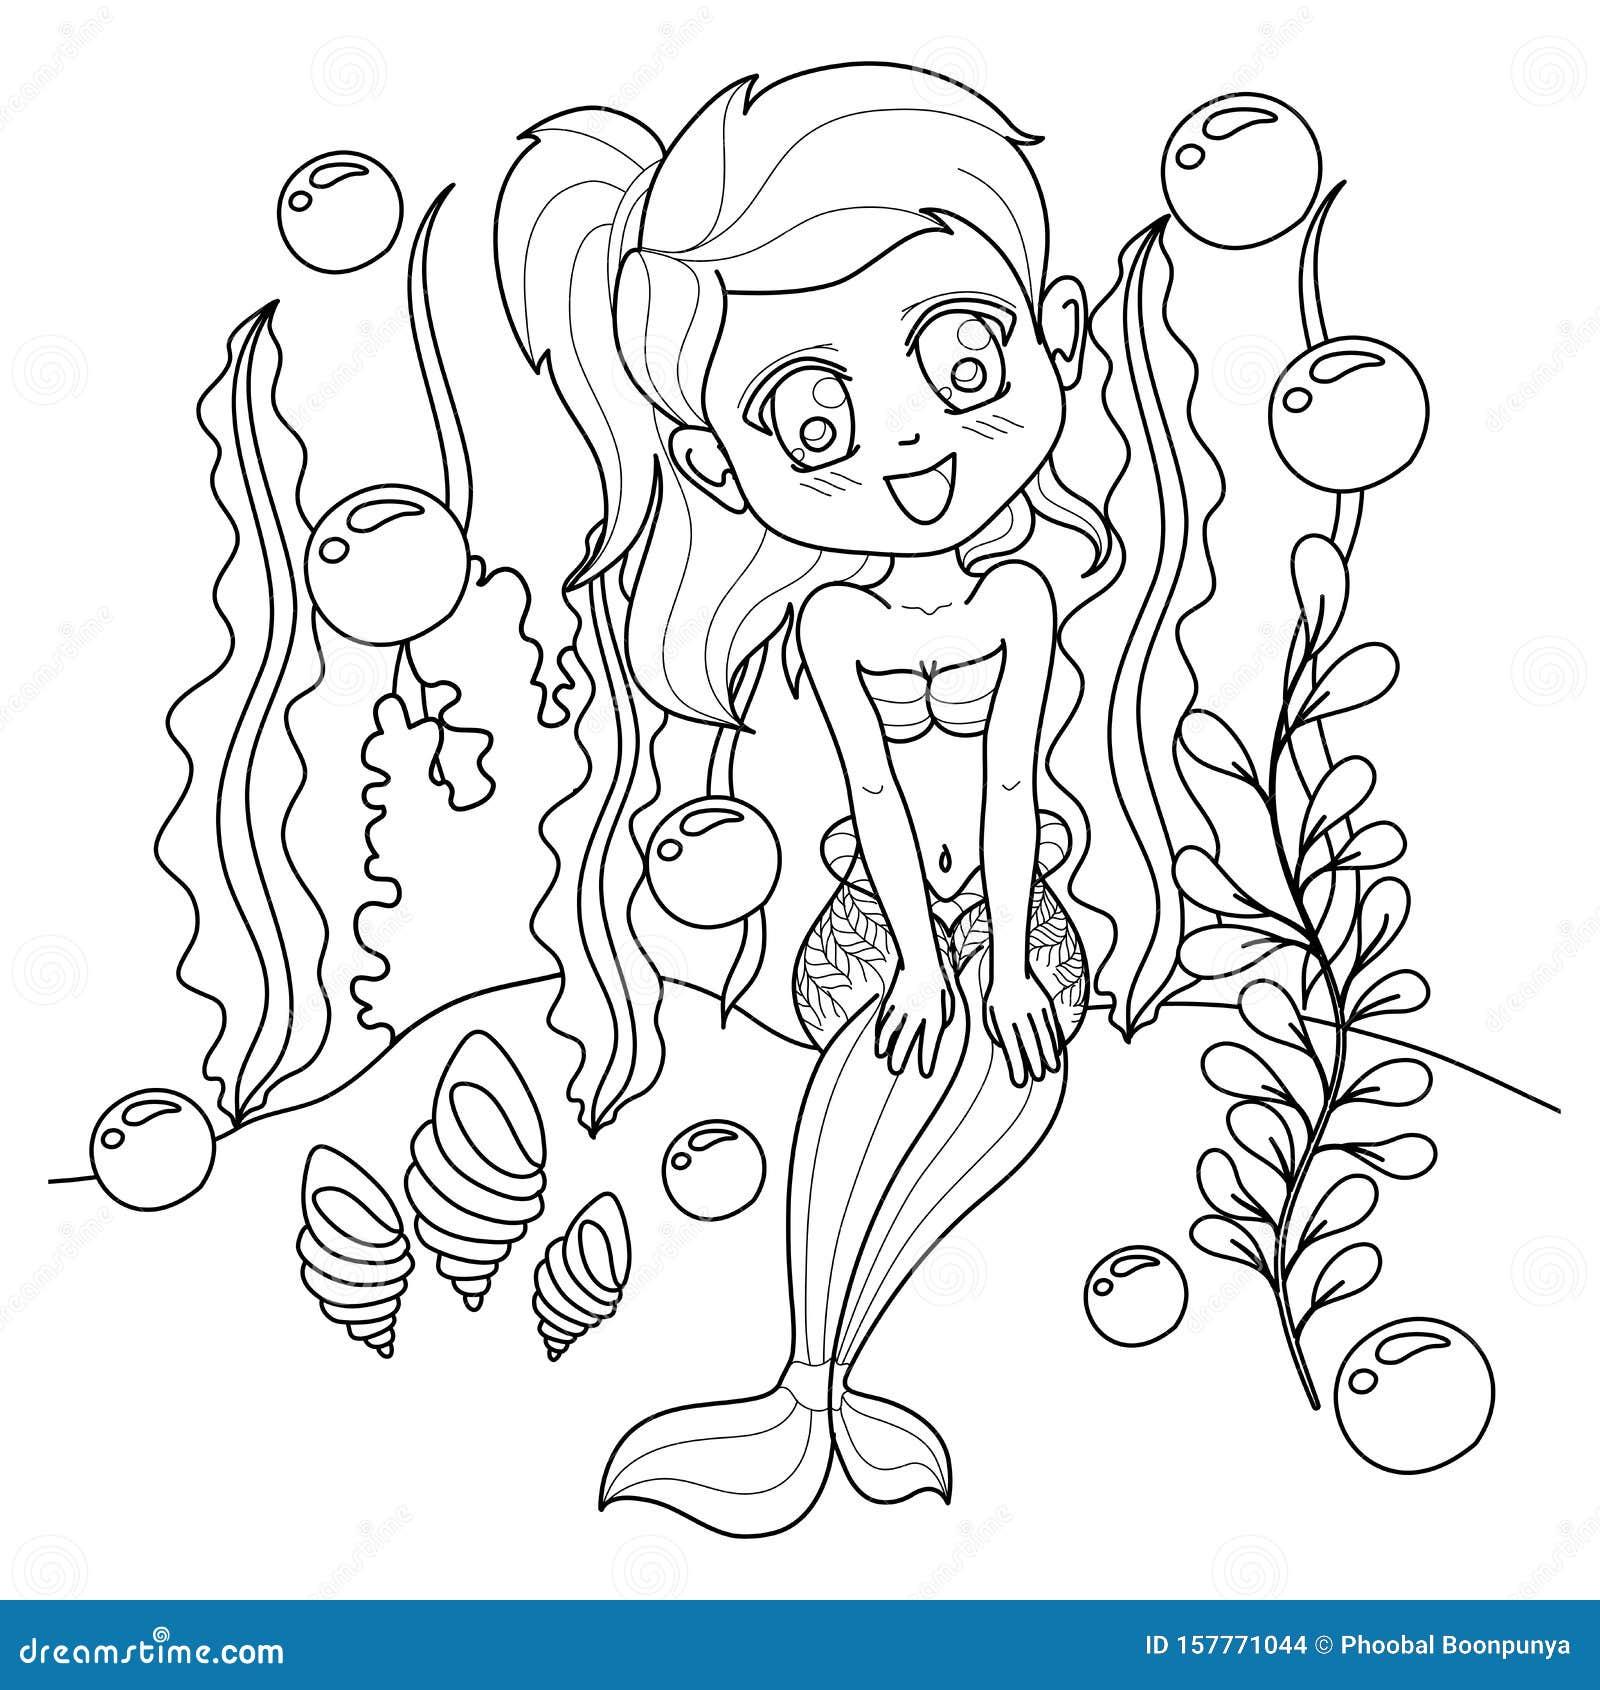 Tinkerbell As Ariel Mermaid Coloring Pages | Mermaid coloring ... | 1689x1600